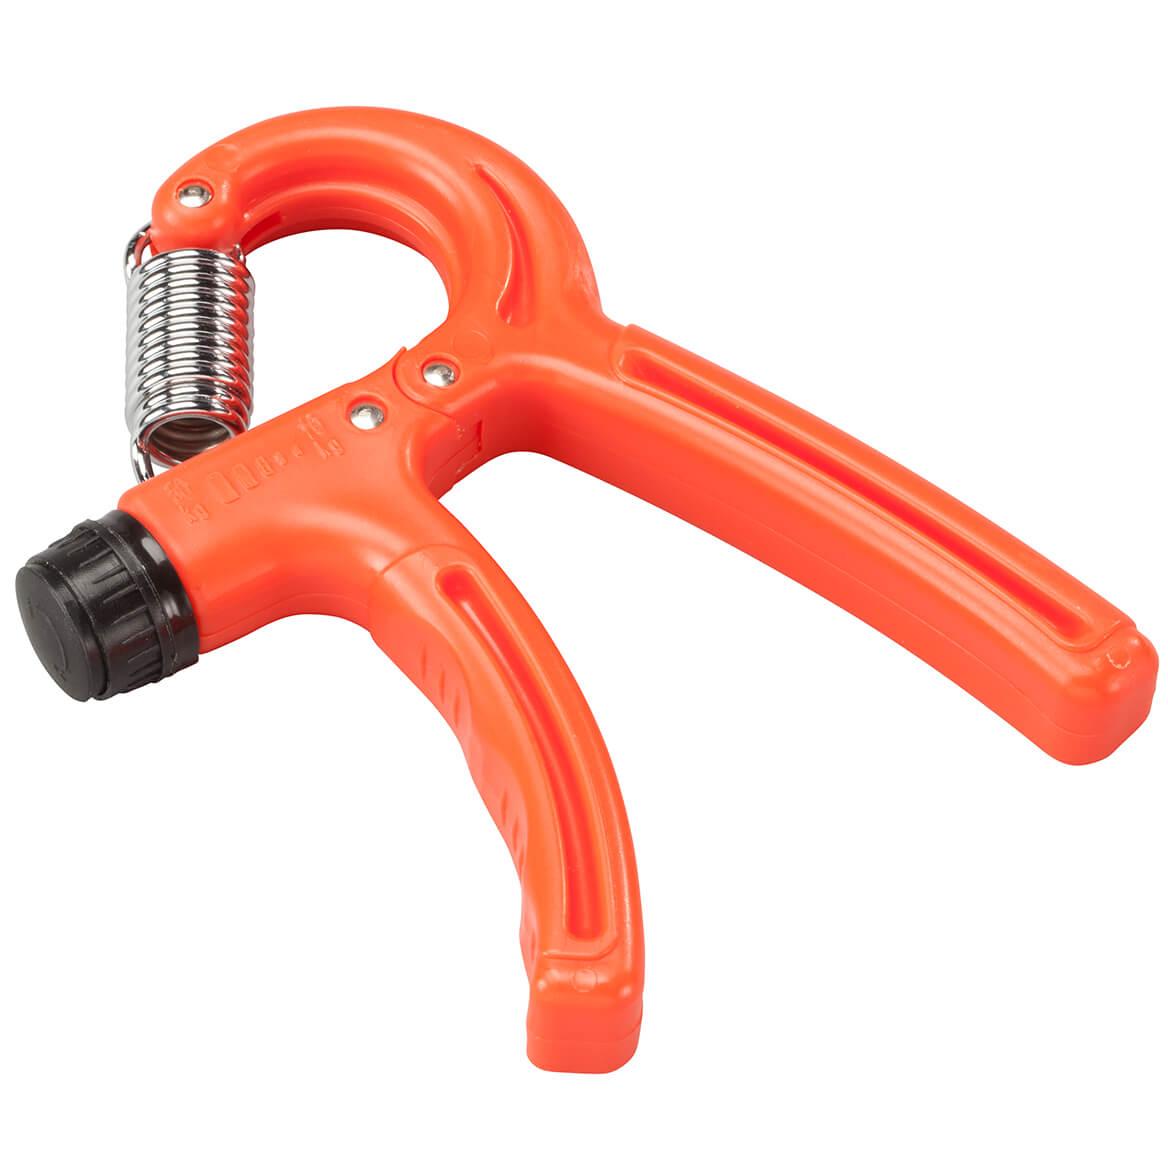 Hand Grip Strengthener 10-50kg-365102